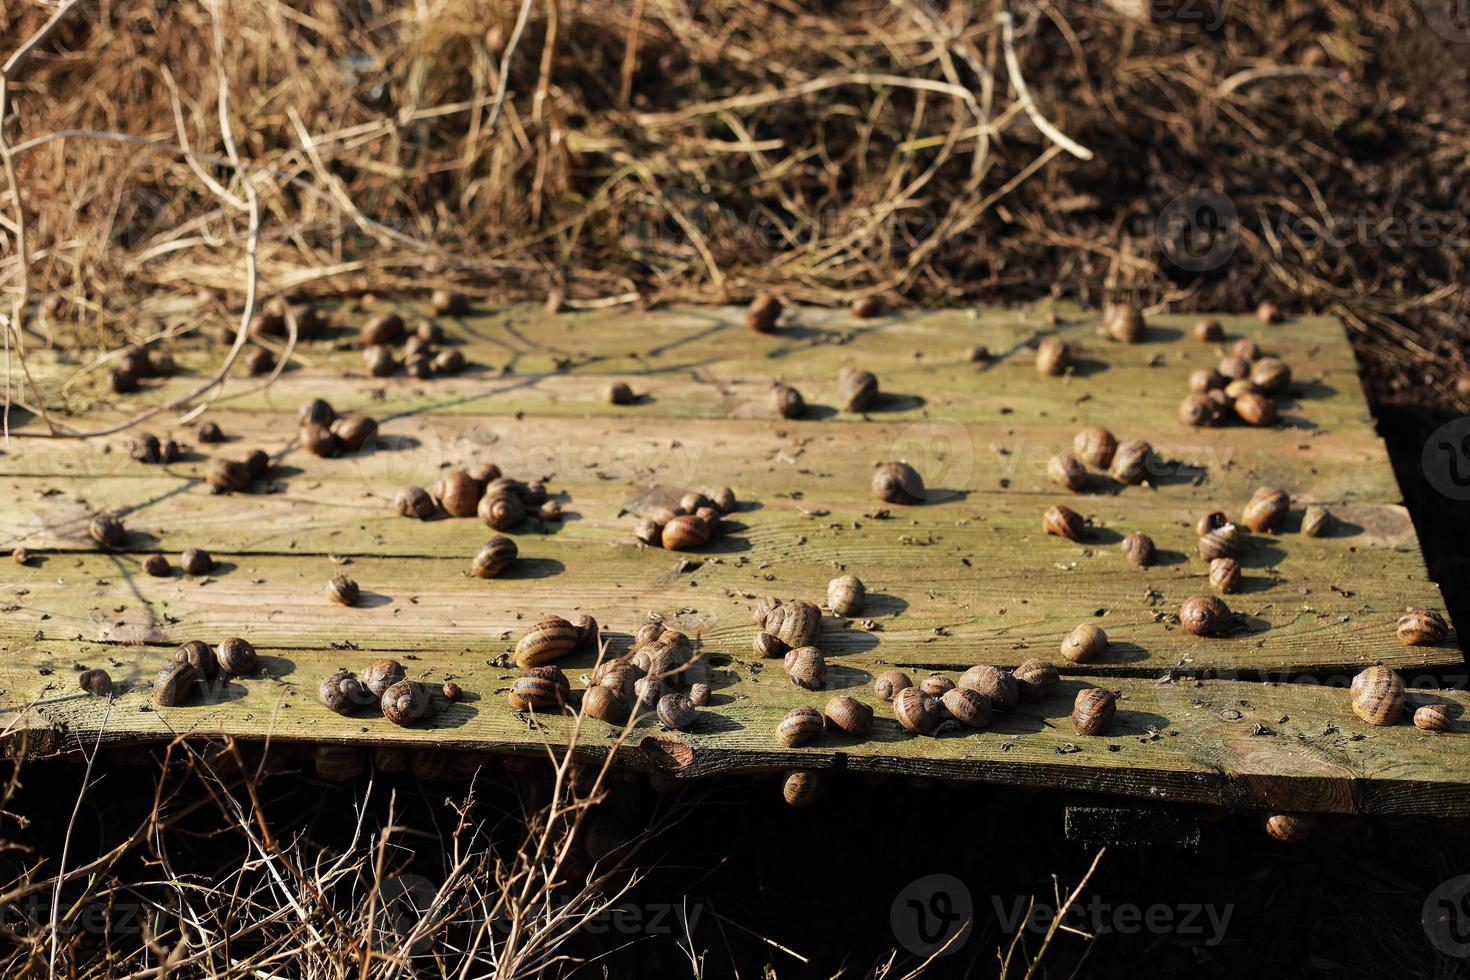 agricultura ecológica, agricultura, caracoles comestibles sobre tablas de madera. producción de caracoles. granja de caracoles. Los caracoles son moluscos con caparazón rayado marrón, en etapa de maduración. foto